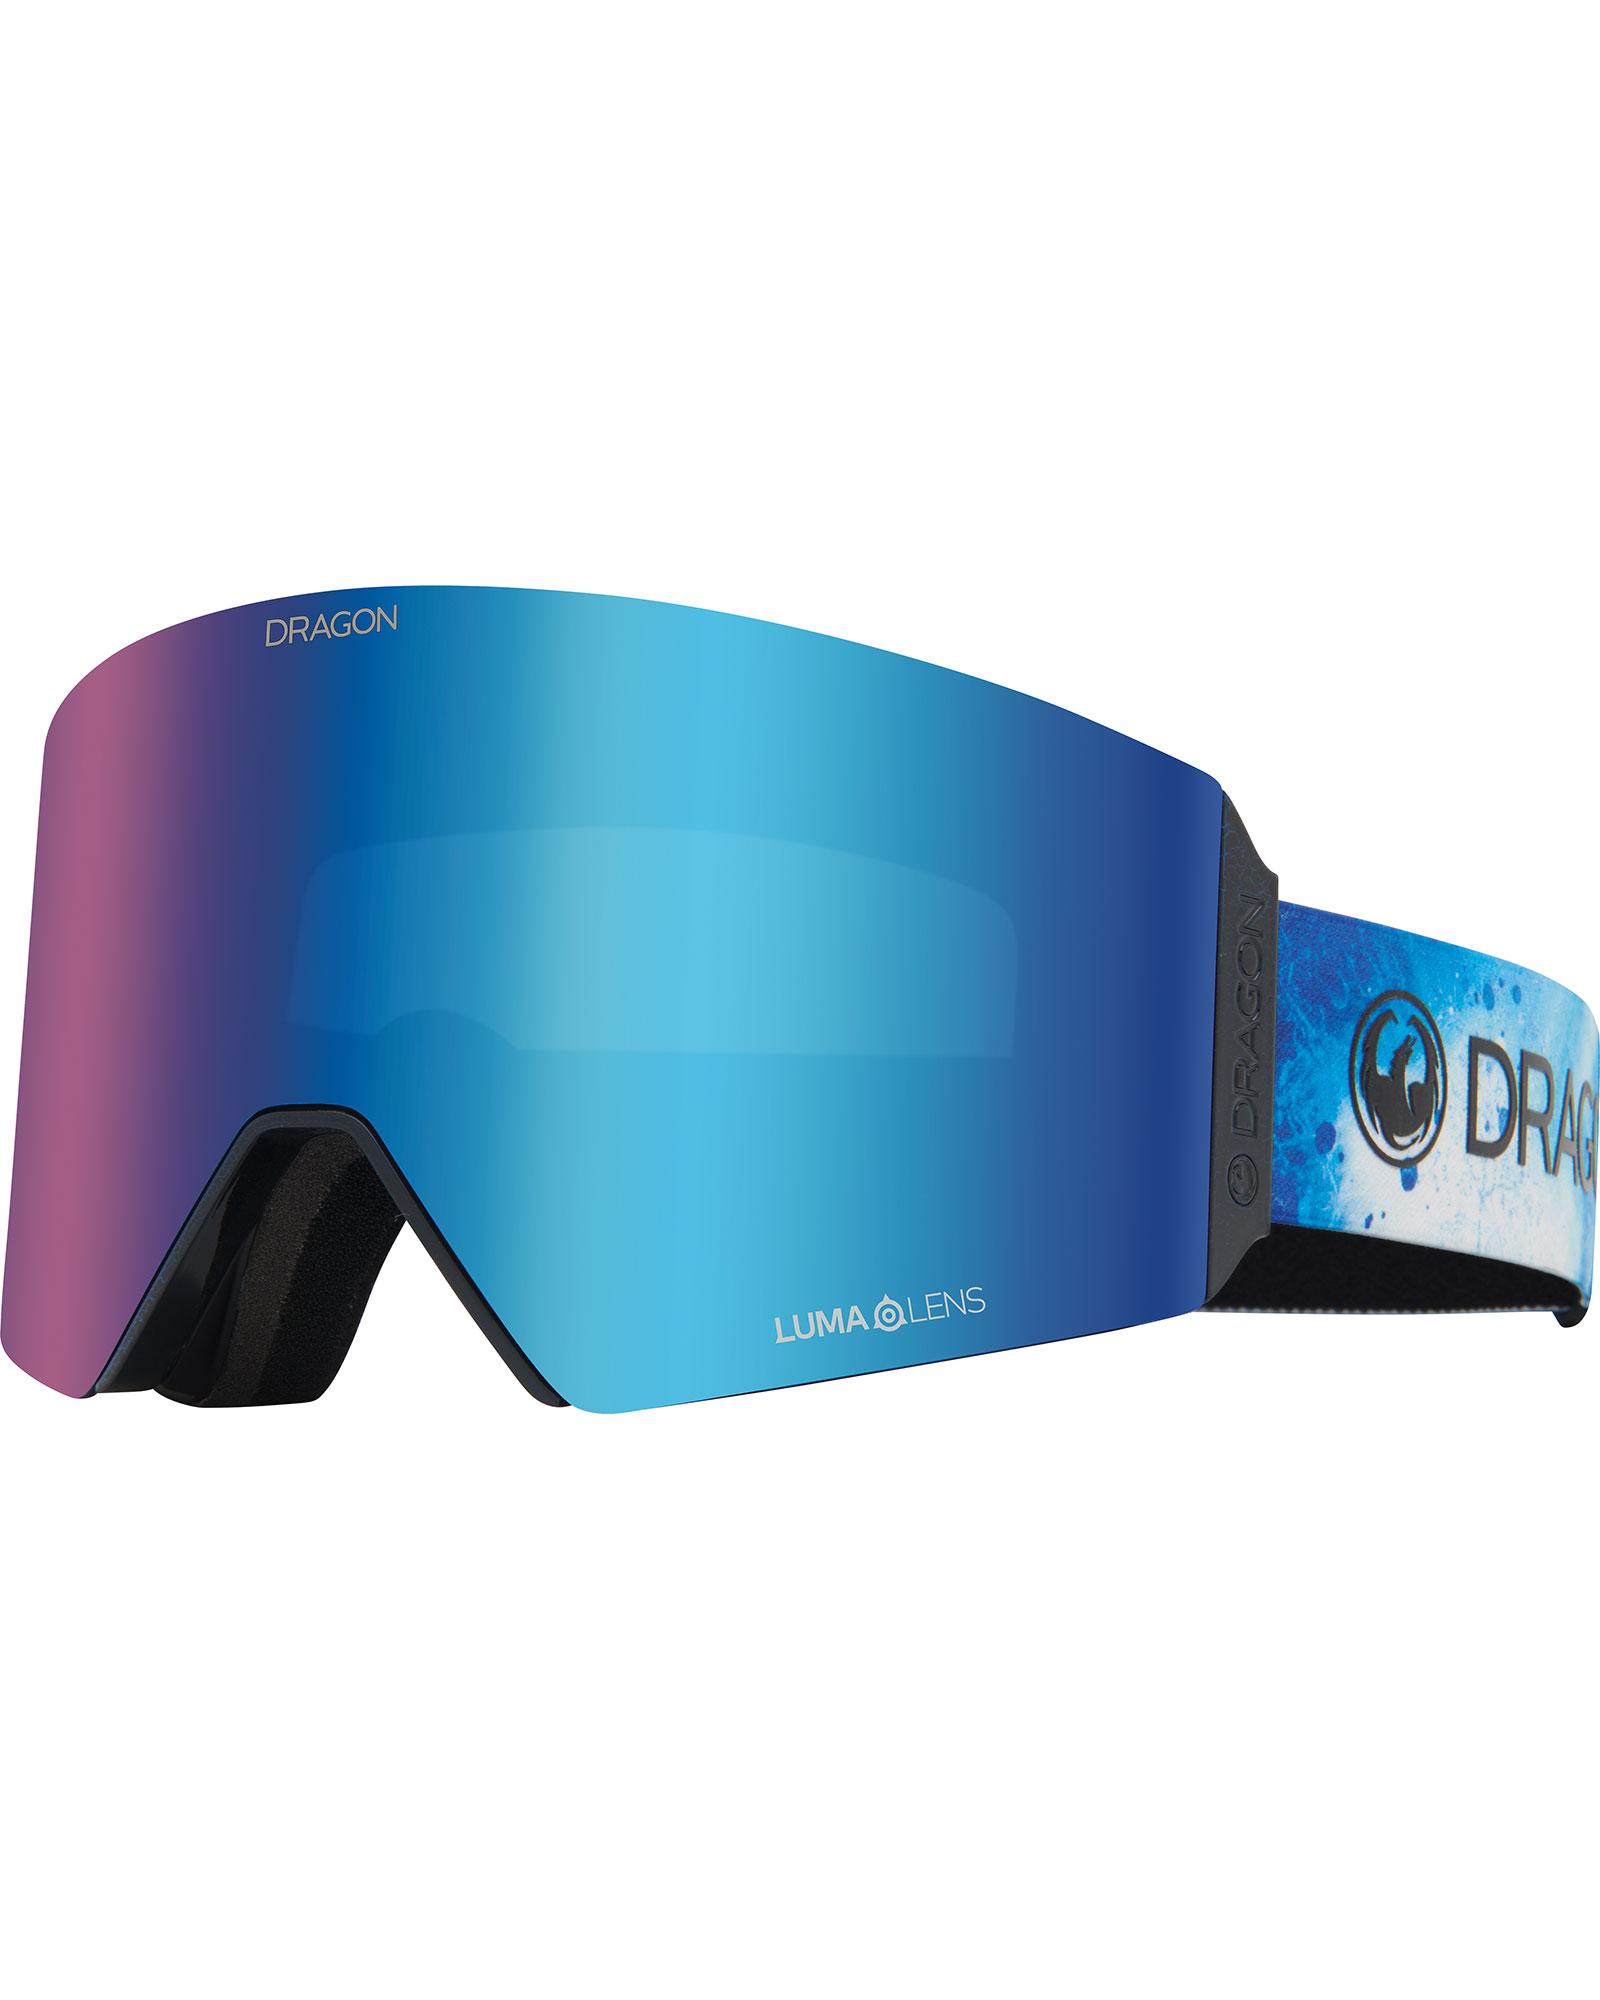 Dragon RVX Permafrost / Lumalens Blue Ionized + Lumalens Amber Goggles 0